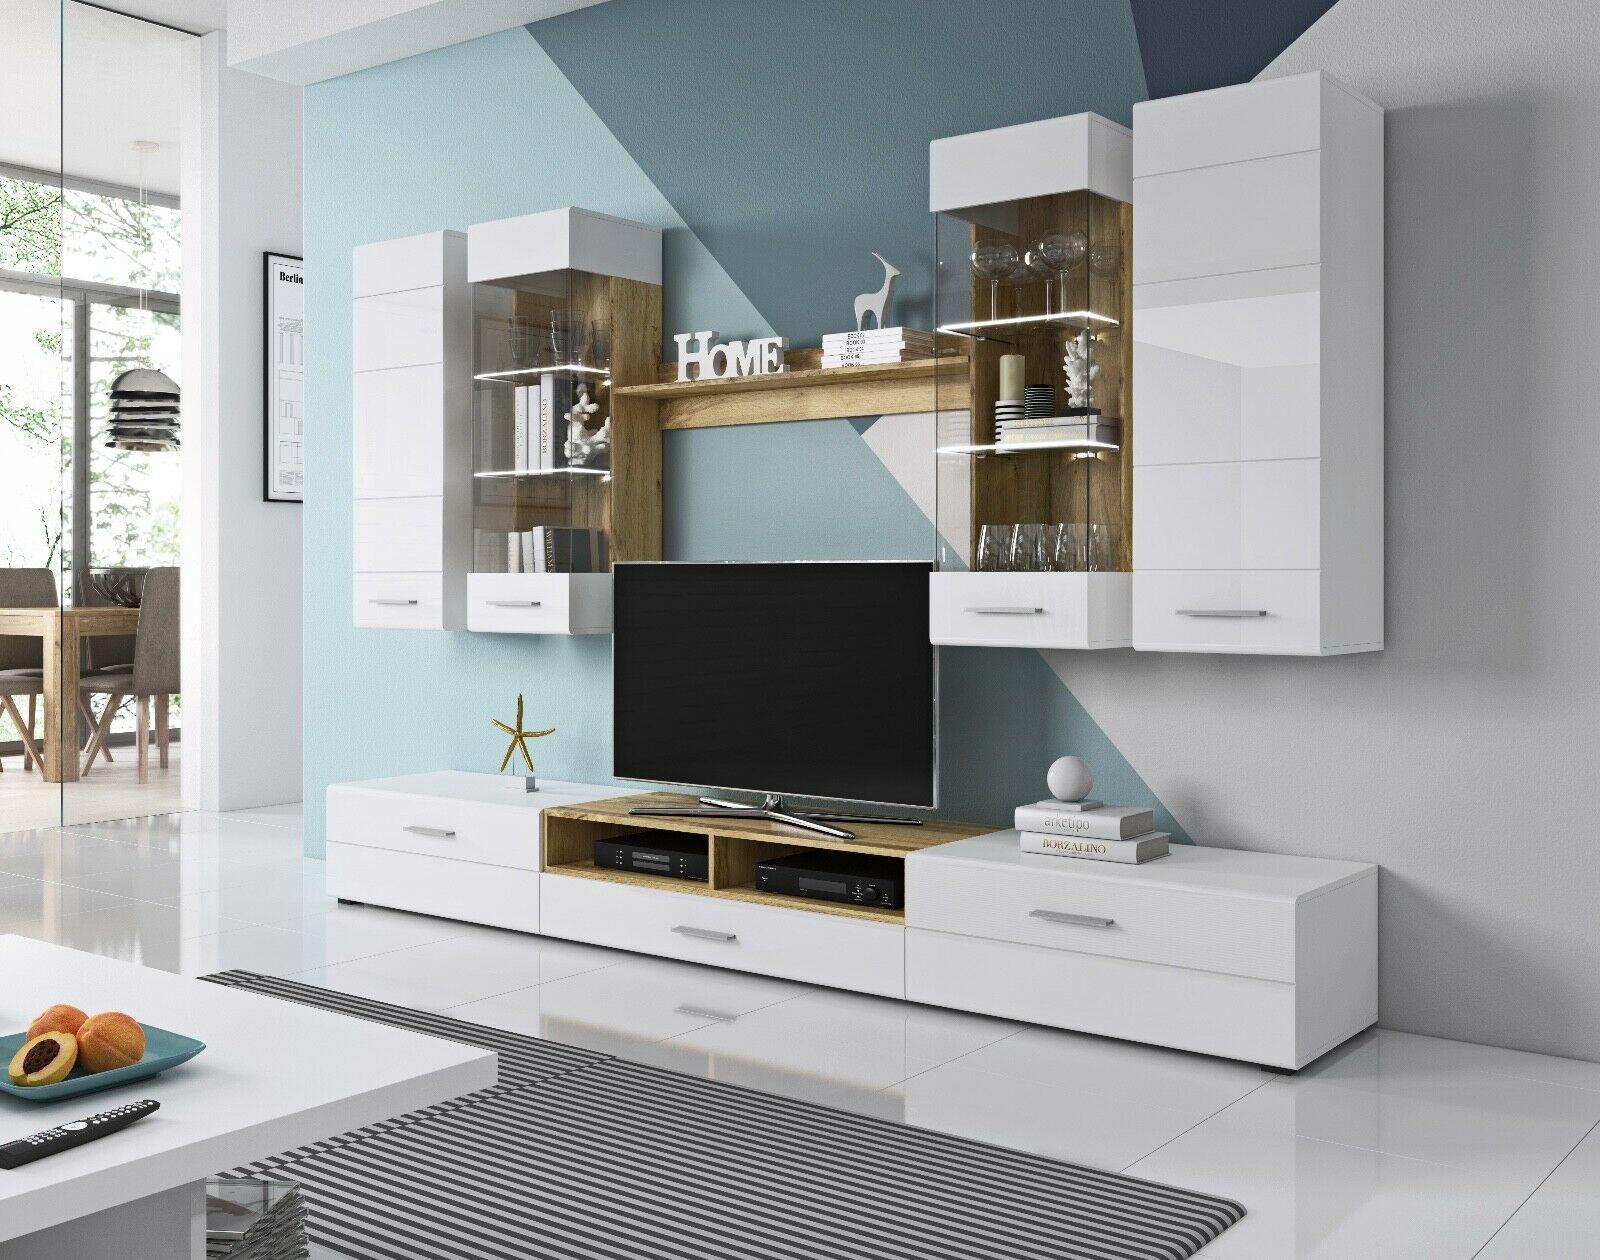 Wohnwand Anbauwand Wohnzimmer Möbel TV-Wand RHODOS inkl. LED 4 Pkt.  Beleuchtung